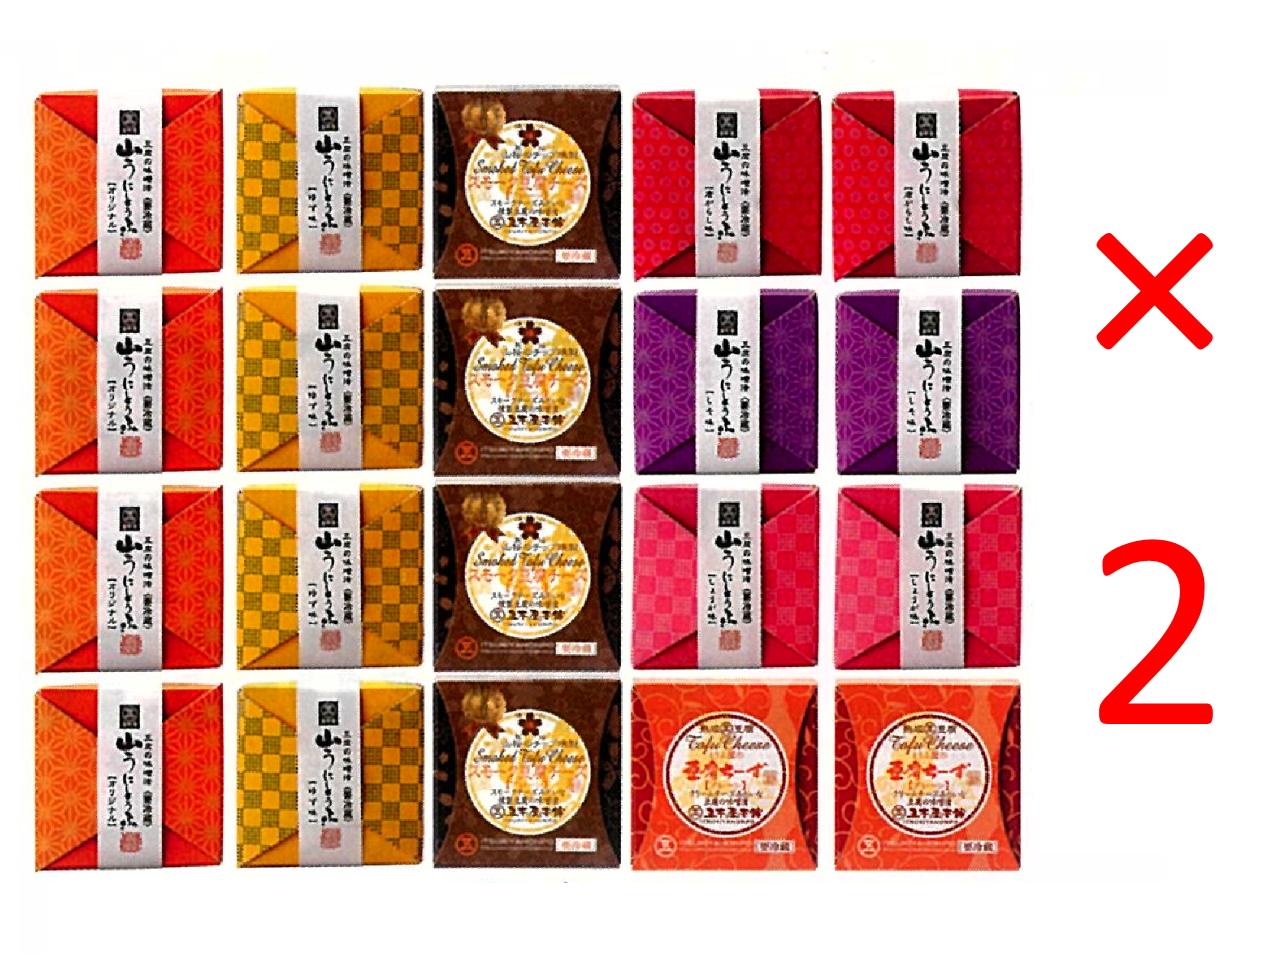 A0185 令和キューブアラカルト20個セット×2【全国送料無料】